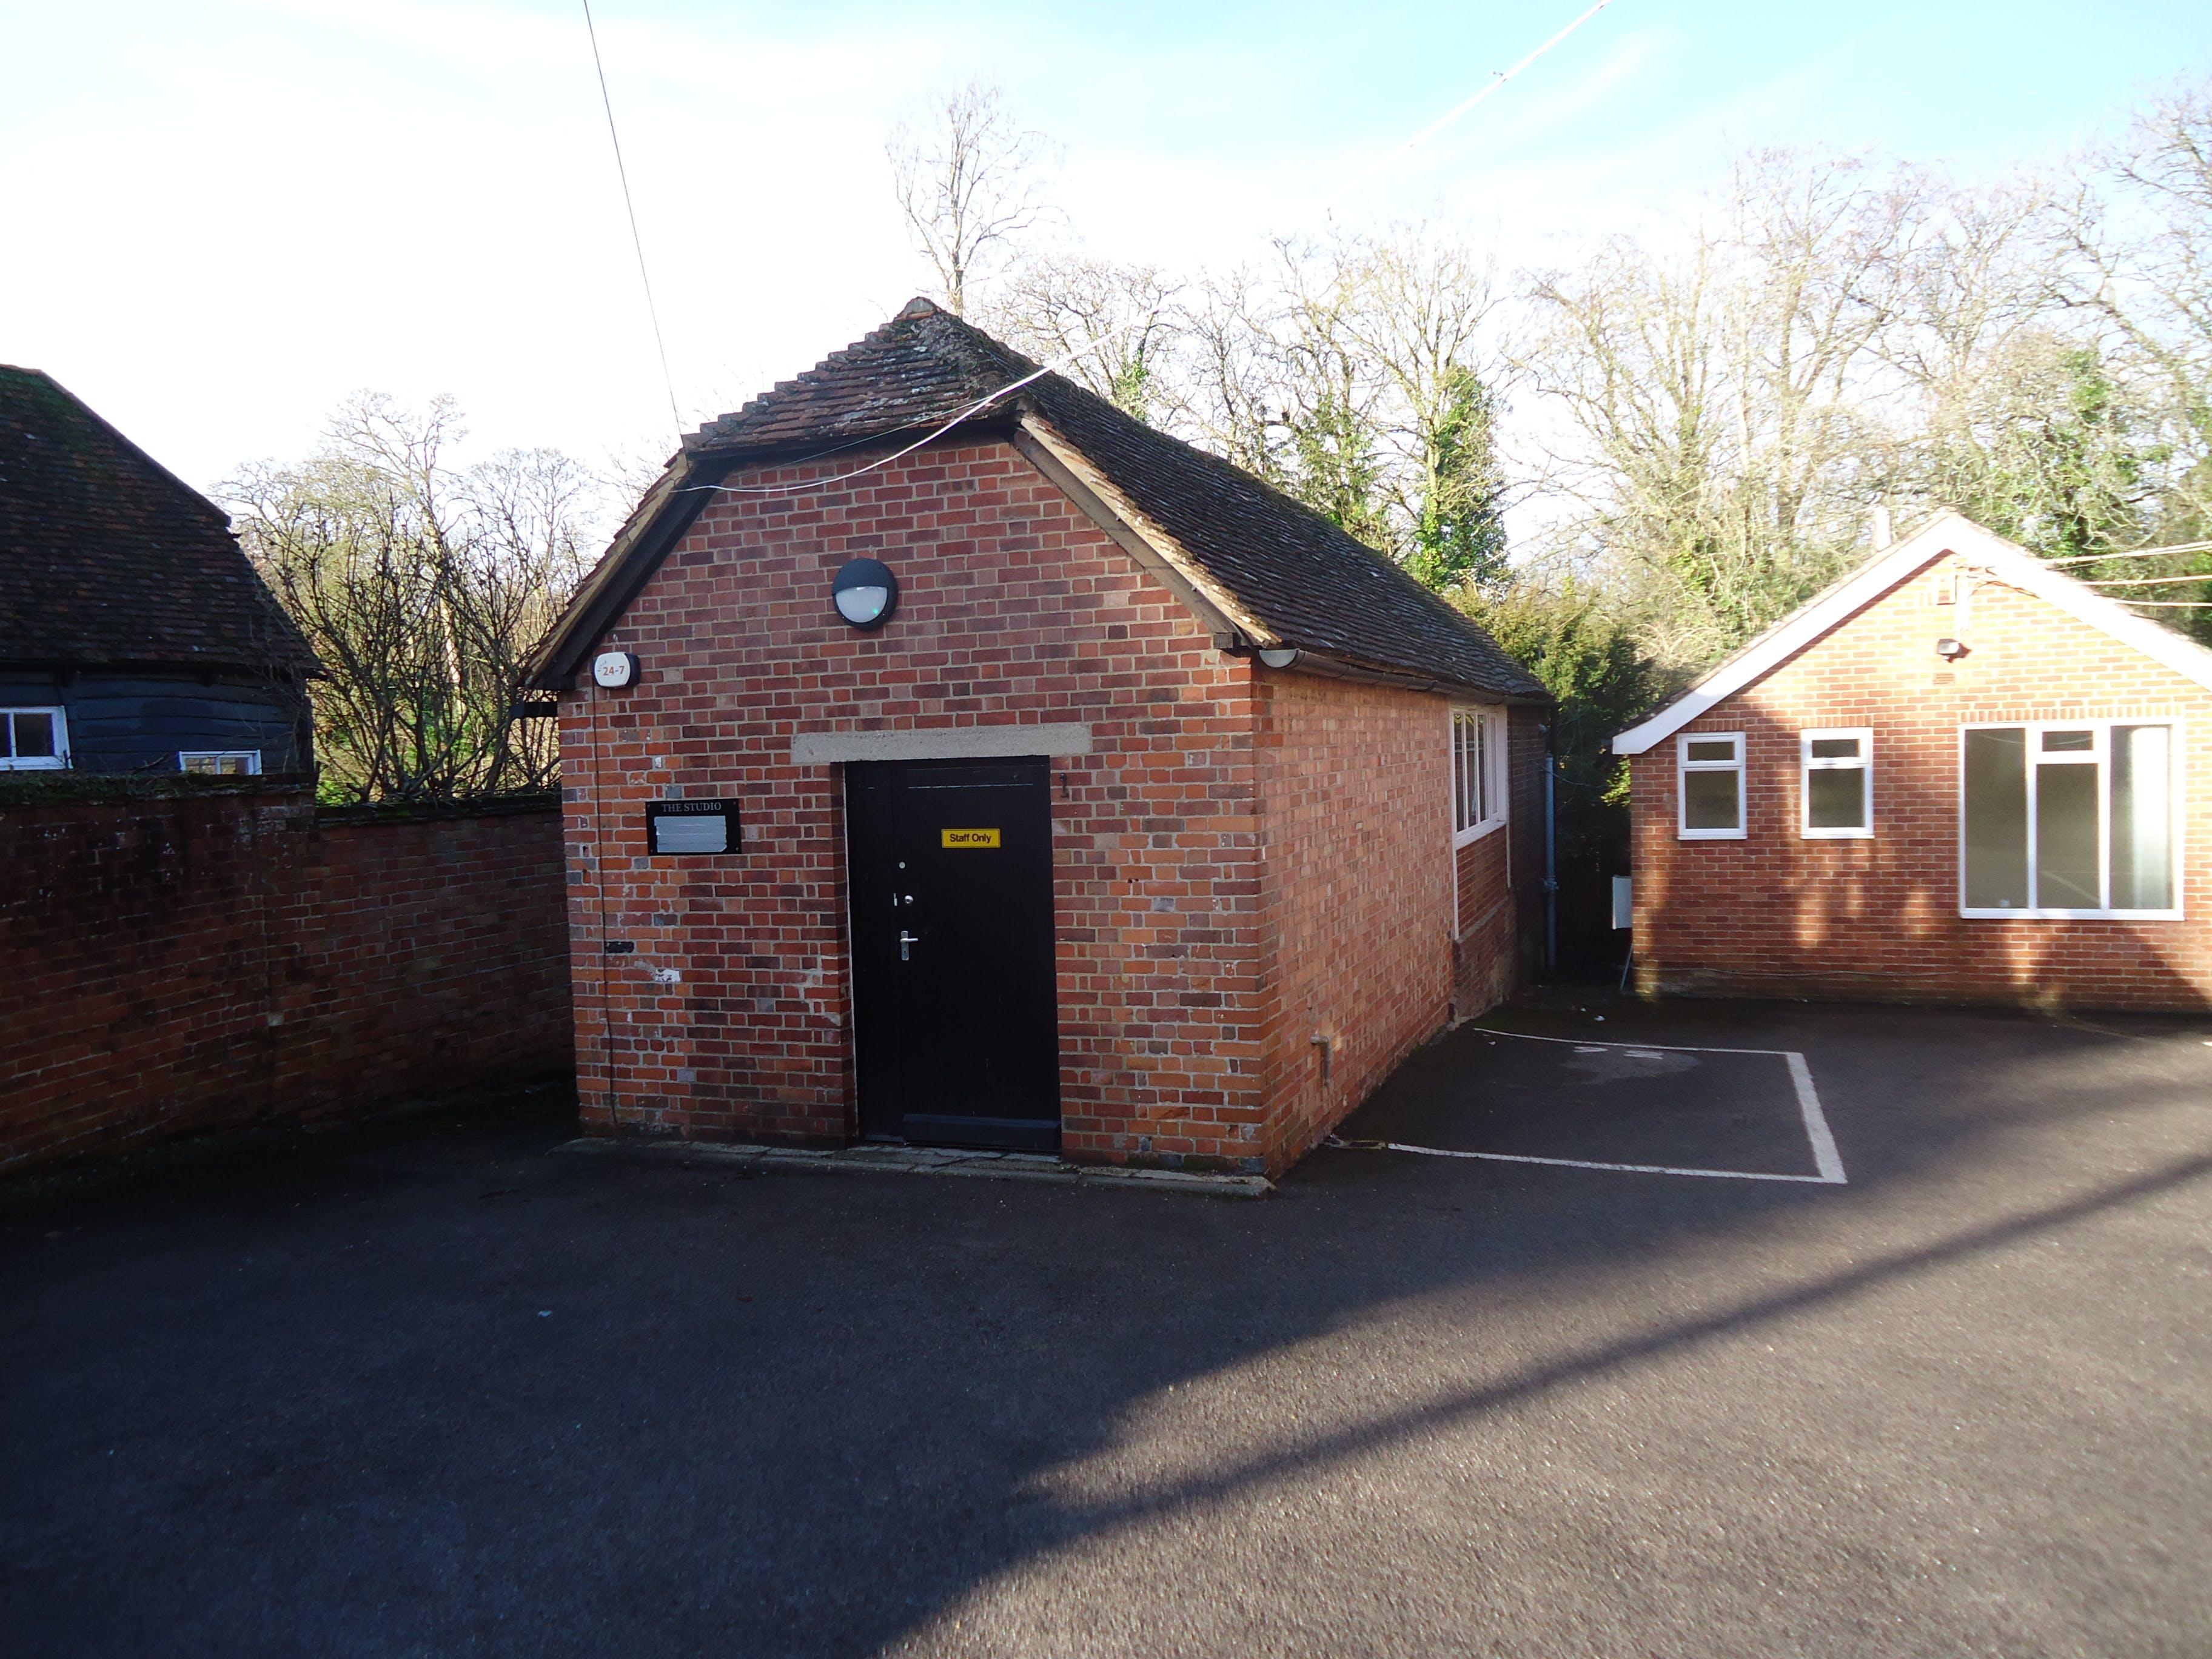 24 Swan Street Kingsclere, 24 Swan Street, Newbury, Development (Land & Buildings) / Investments / Offices For Sale - DSC00004.JPG